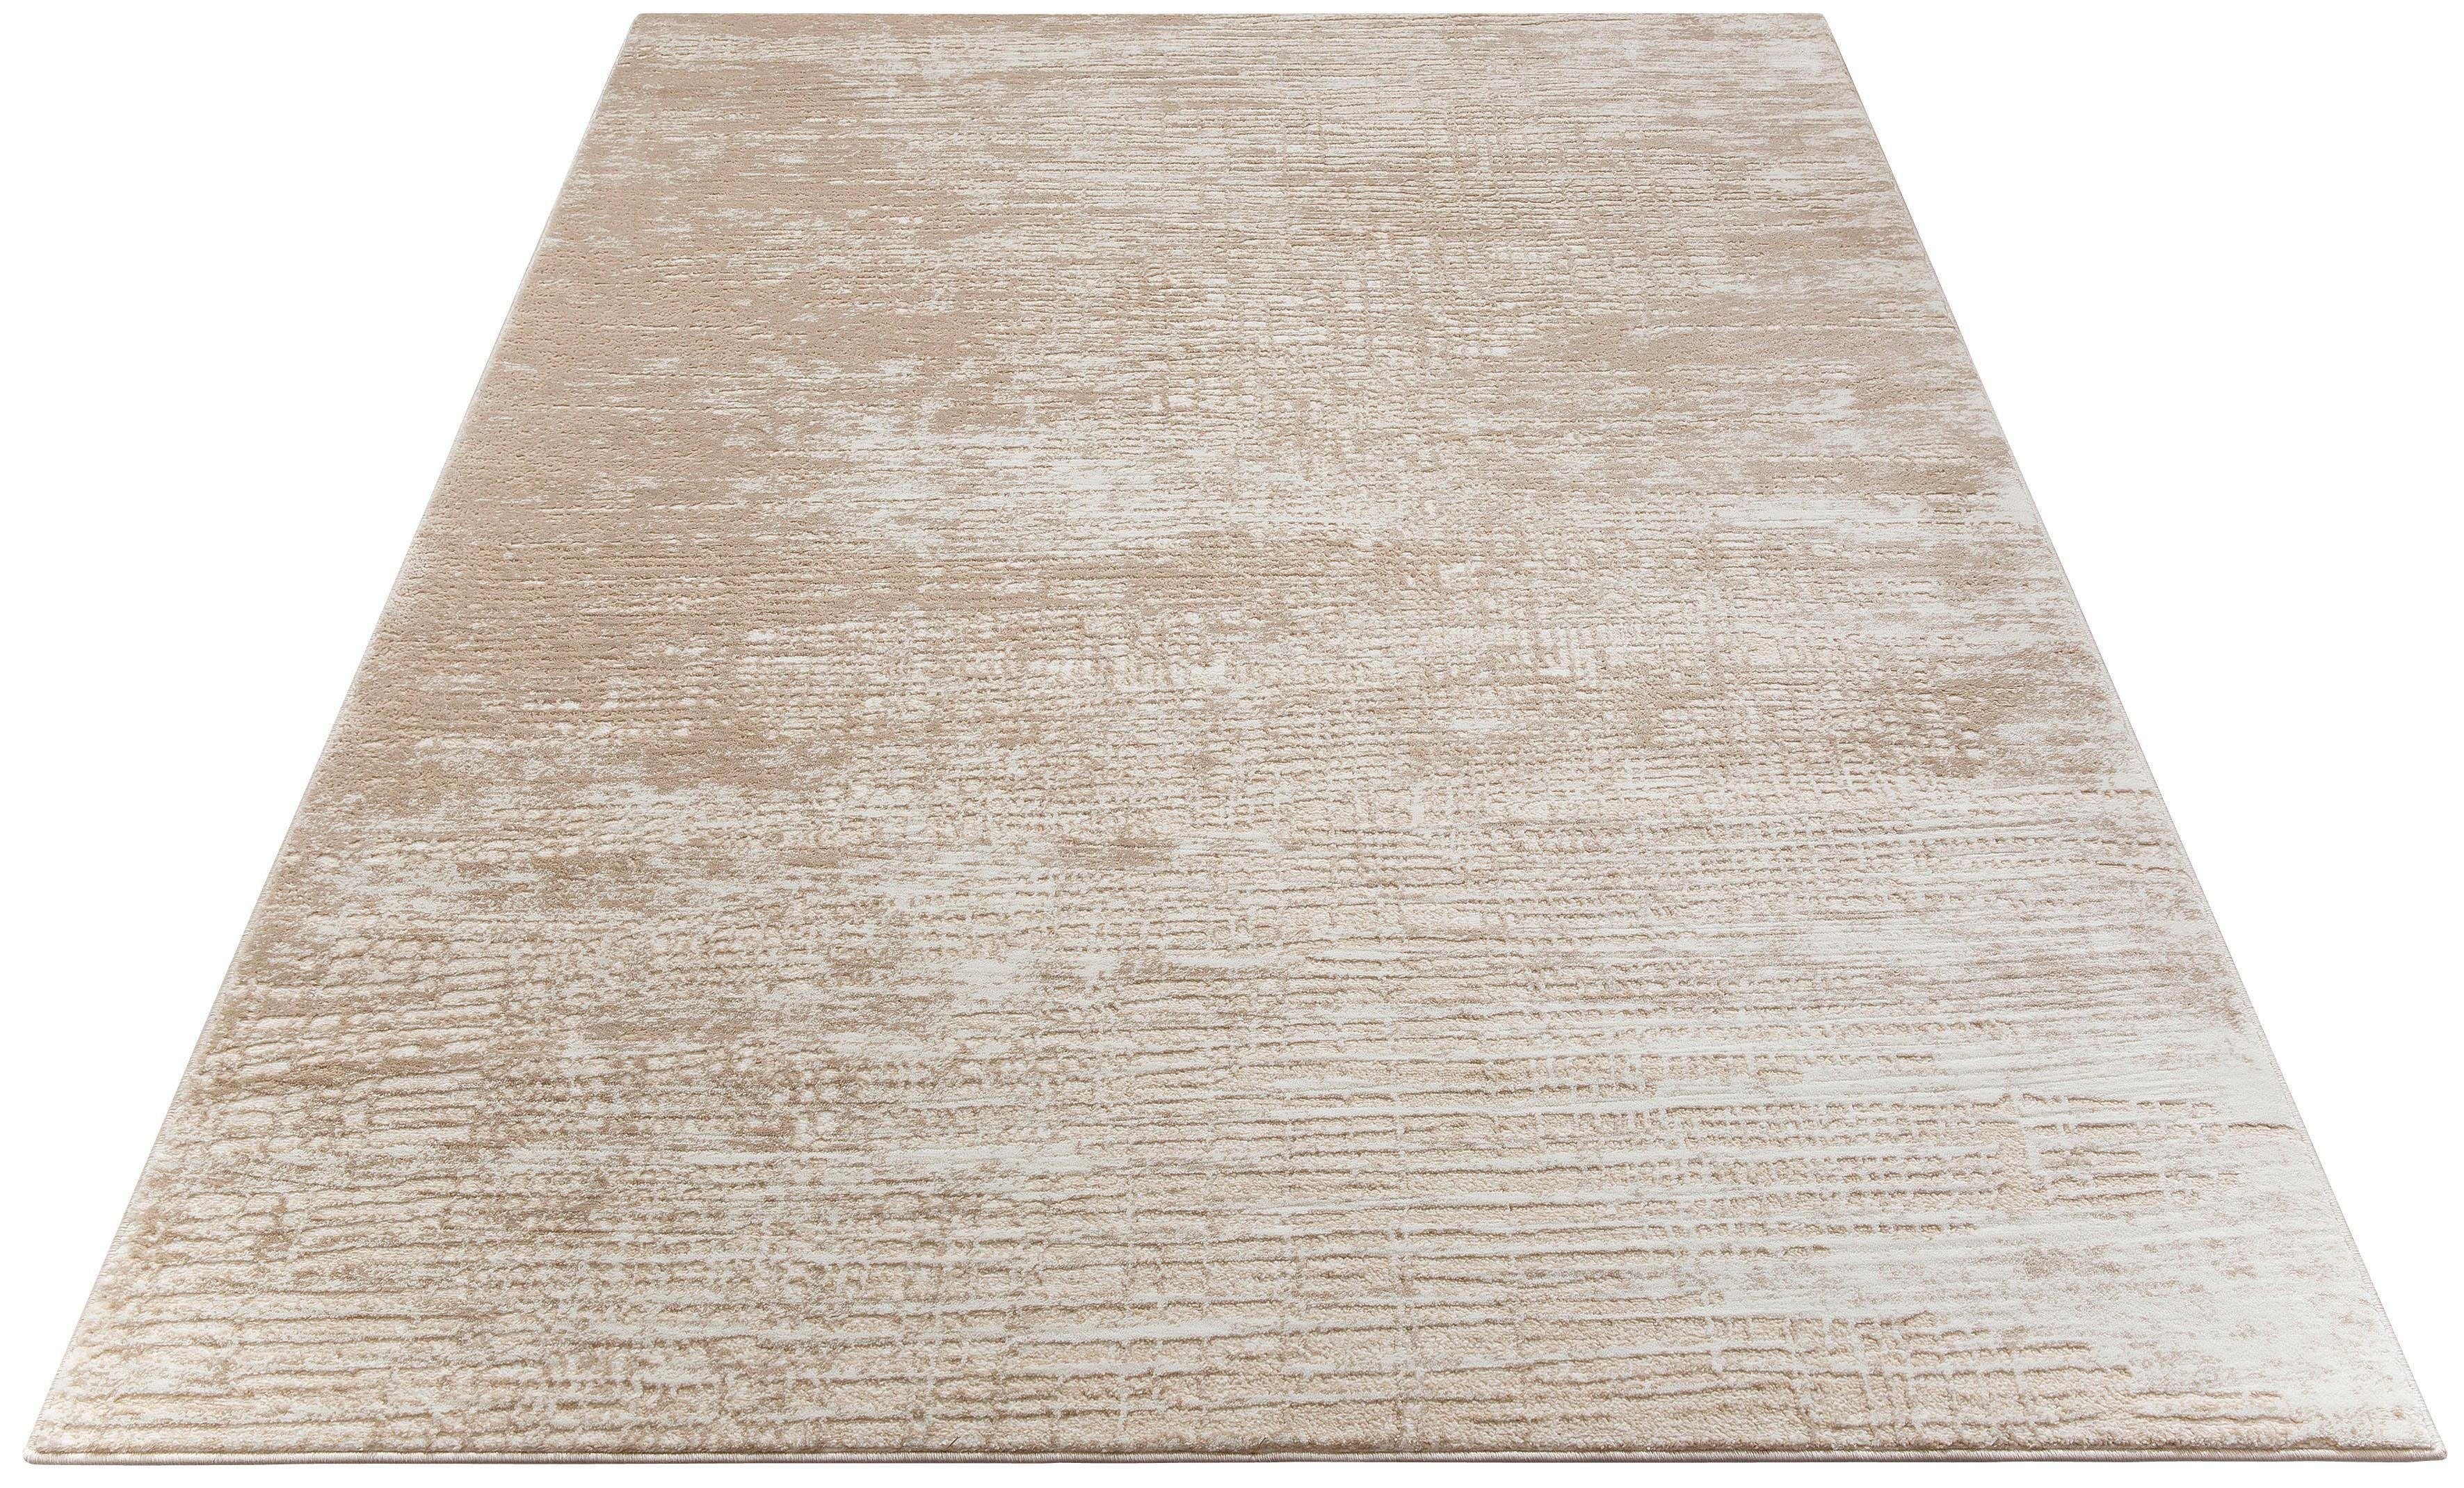 Teppich Ariano Home affaire rechteckig Höhe 12 mm maschinell gewebt